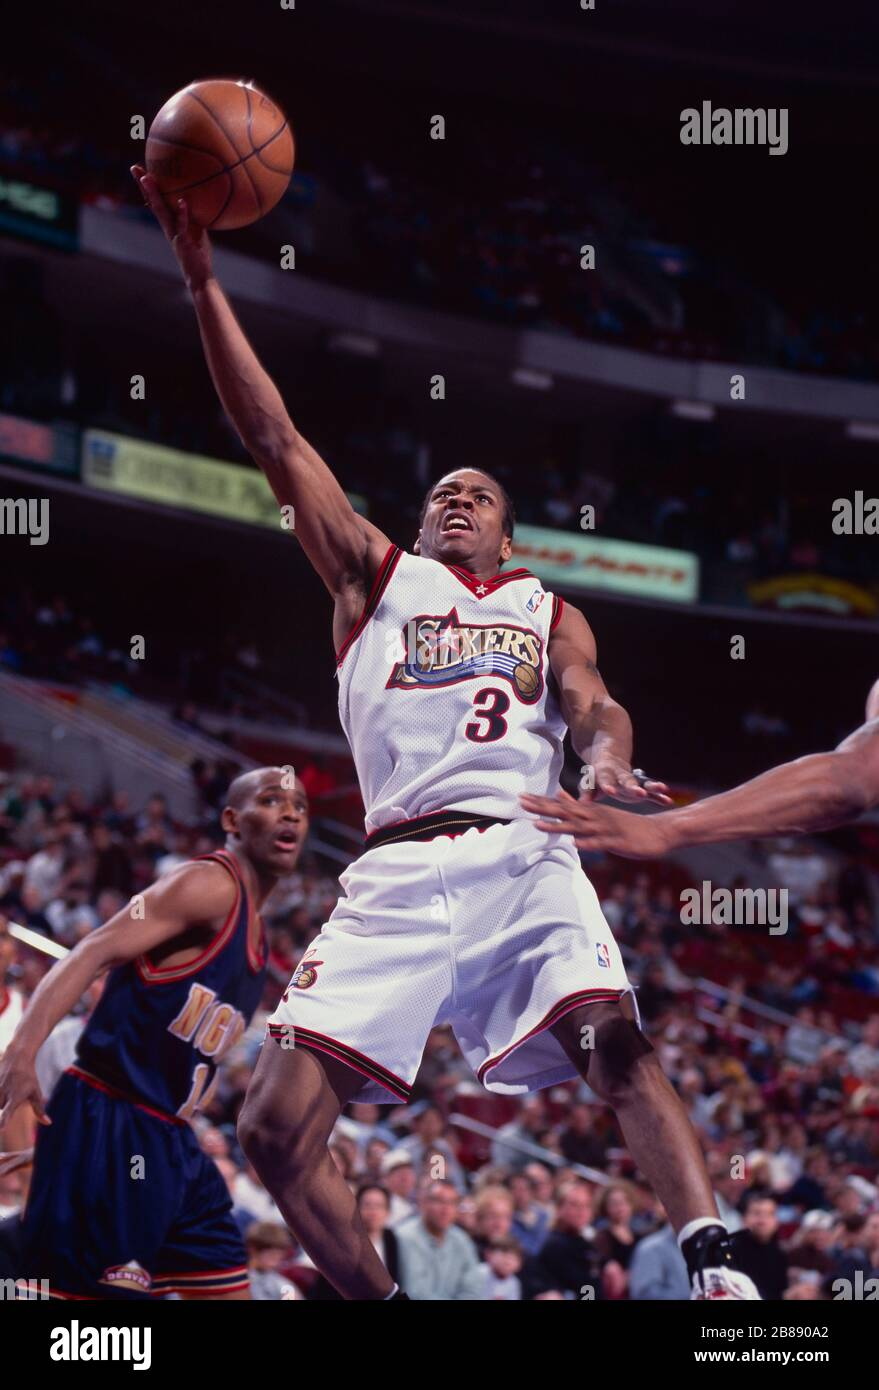 Allen Iverson of the Philadelphia 76ers Stock Photo